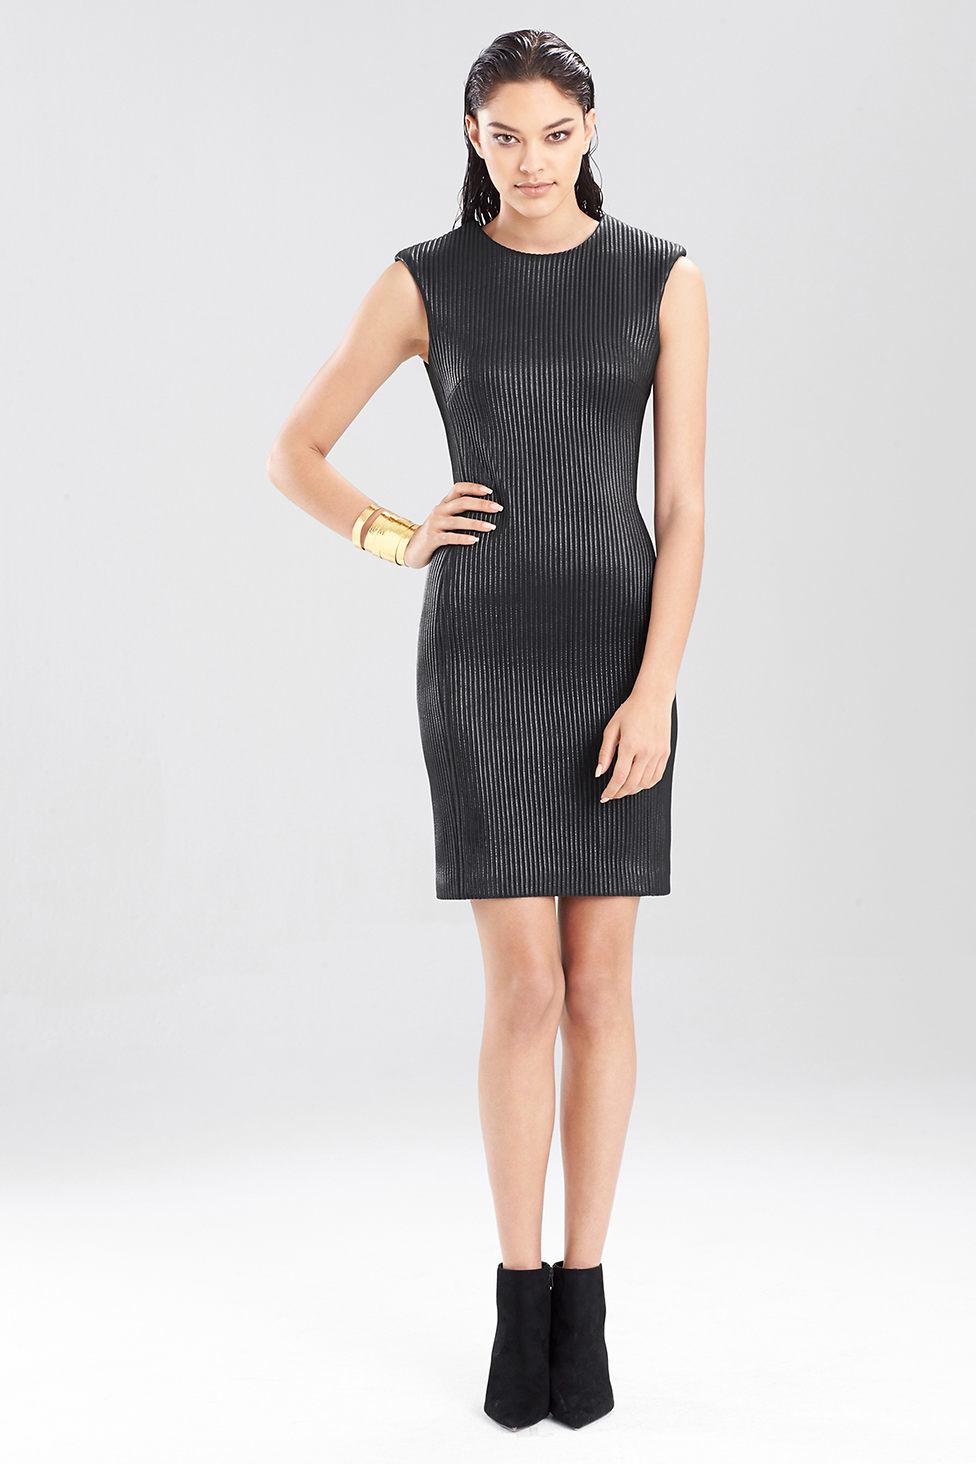 Natori Ottoman Shine Sleeveless Dress in Black